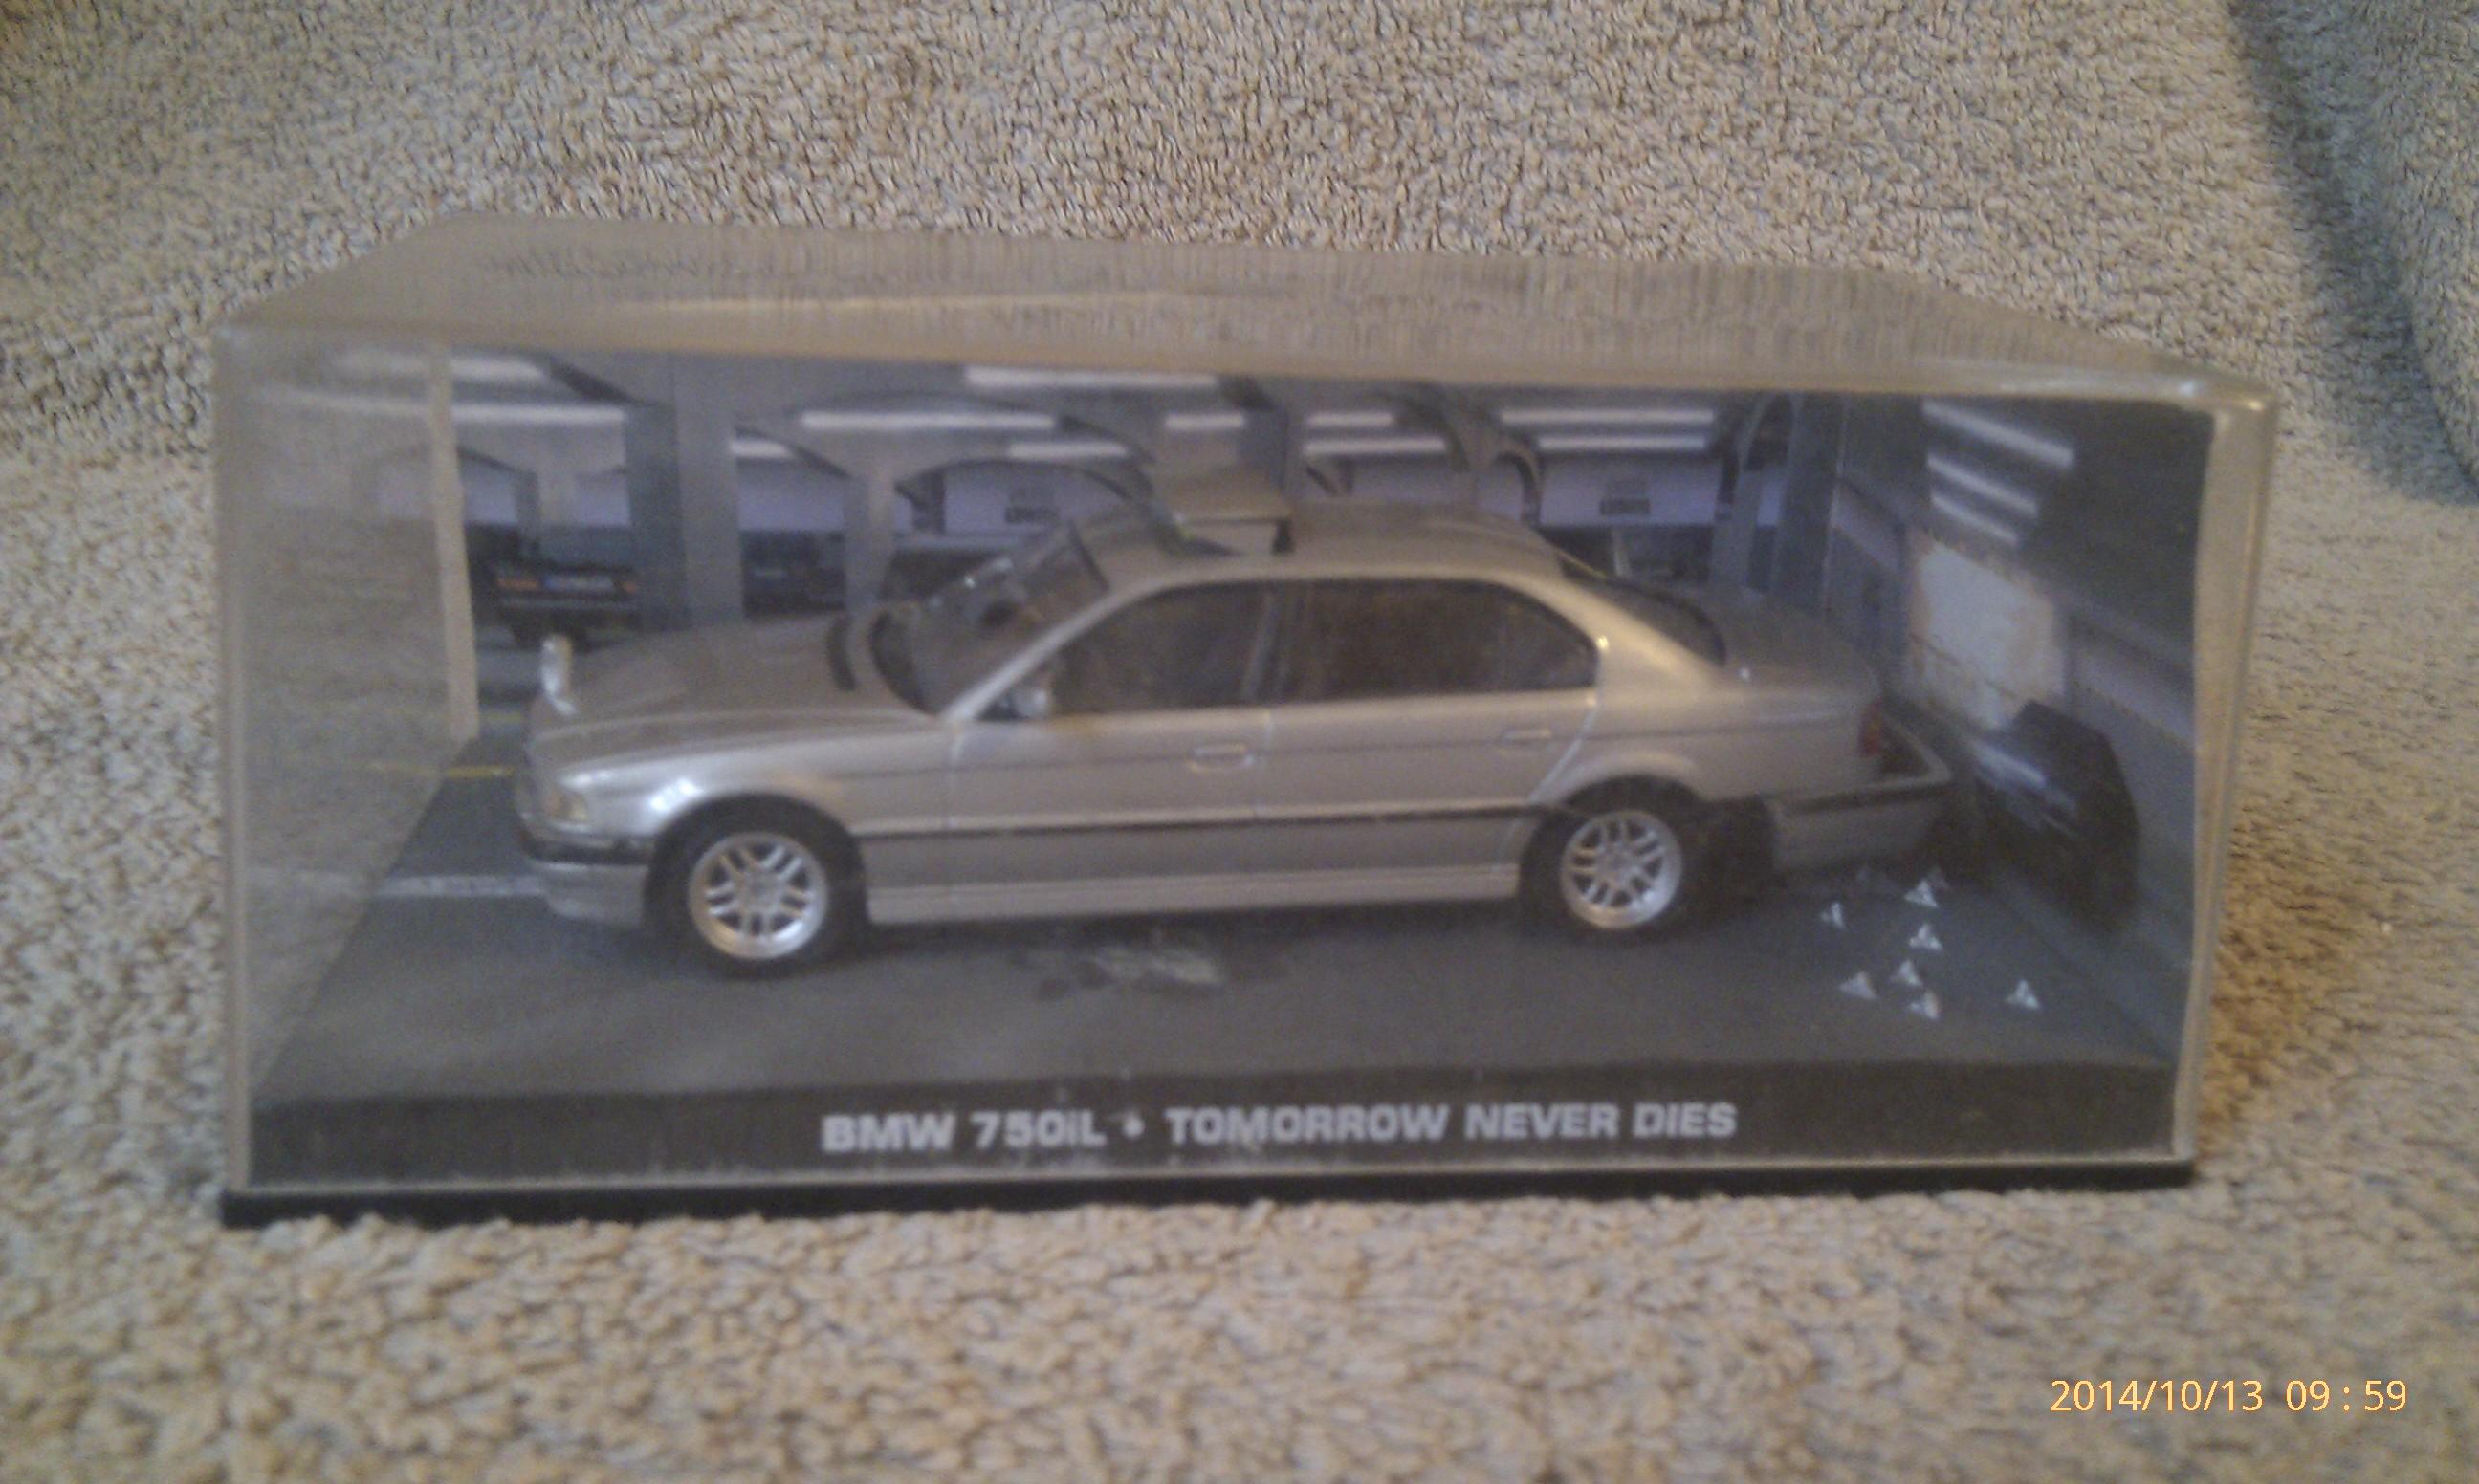 BMW 750i - James Bond - Tomorrow Never Dies